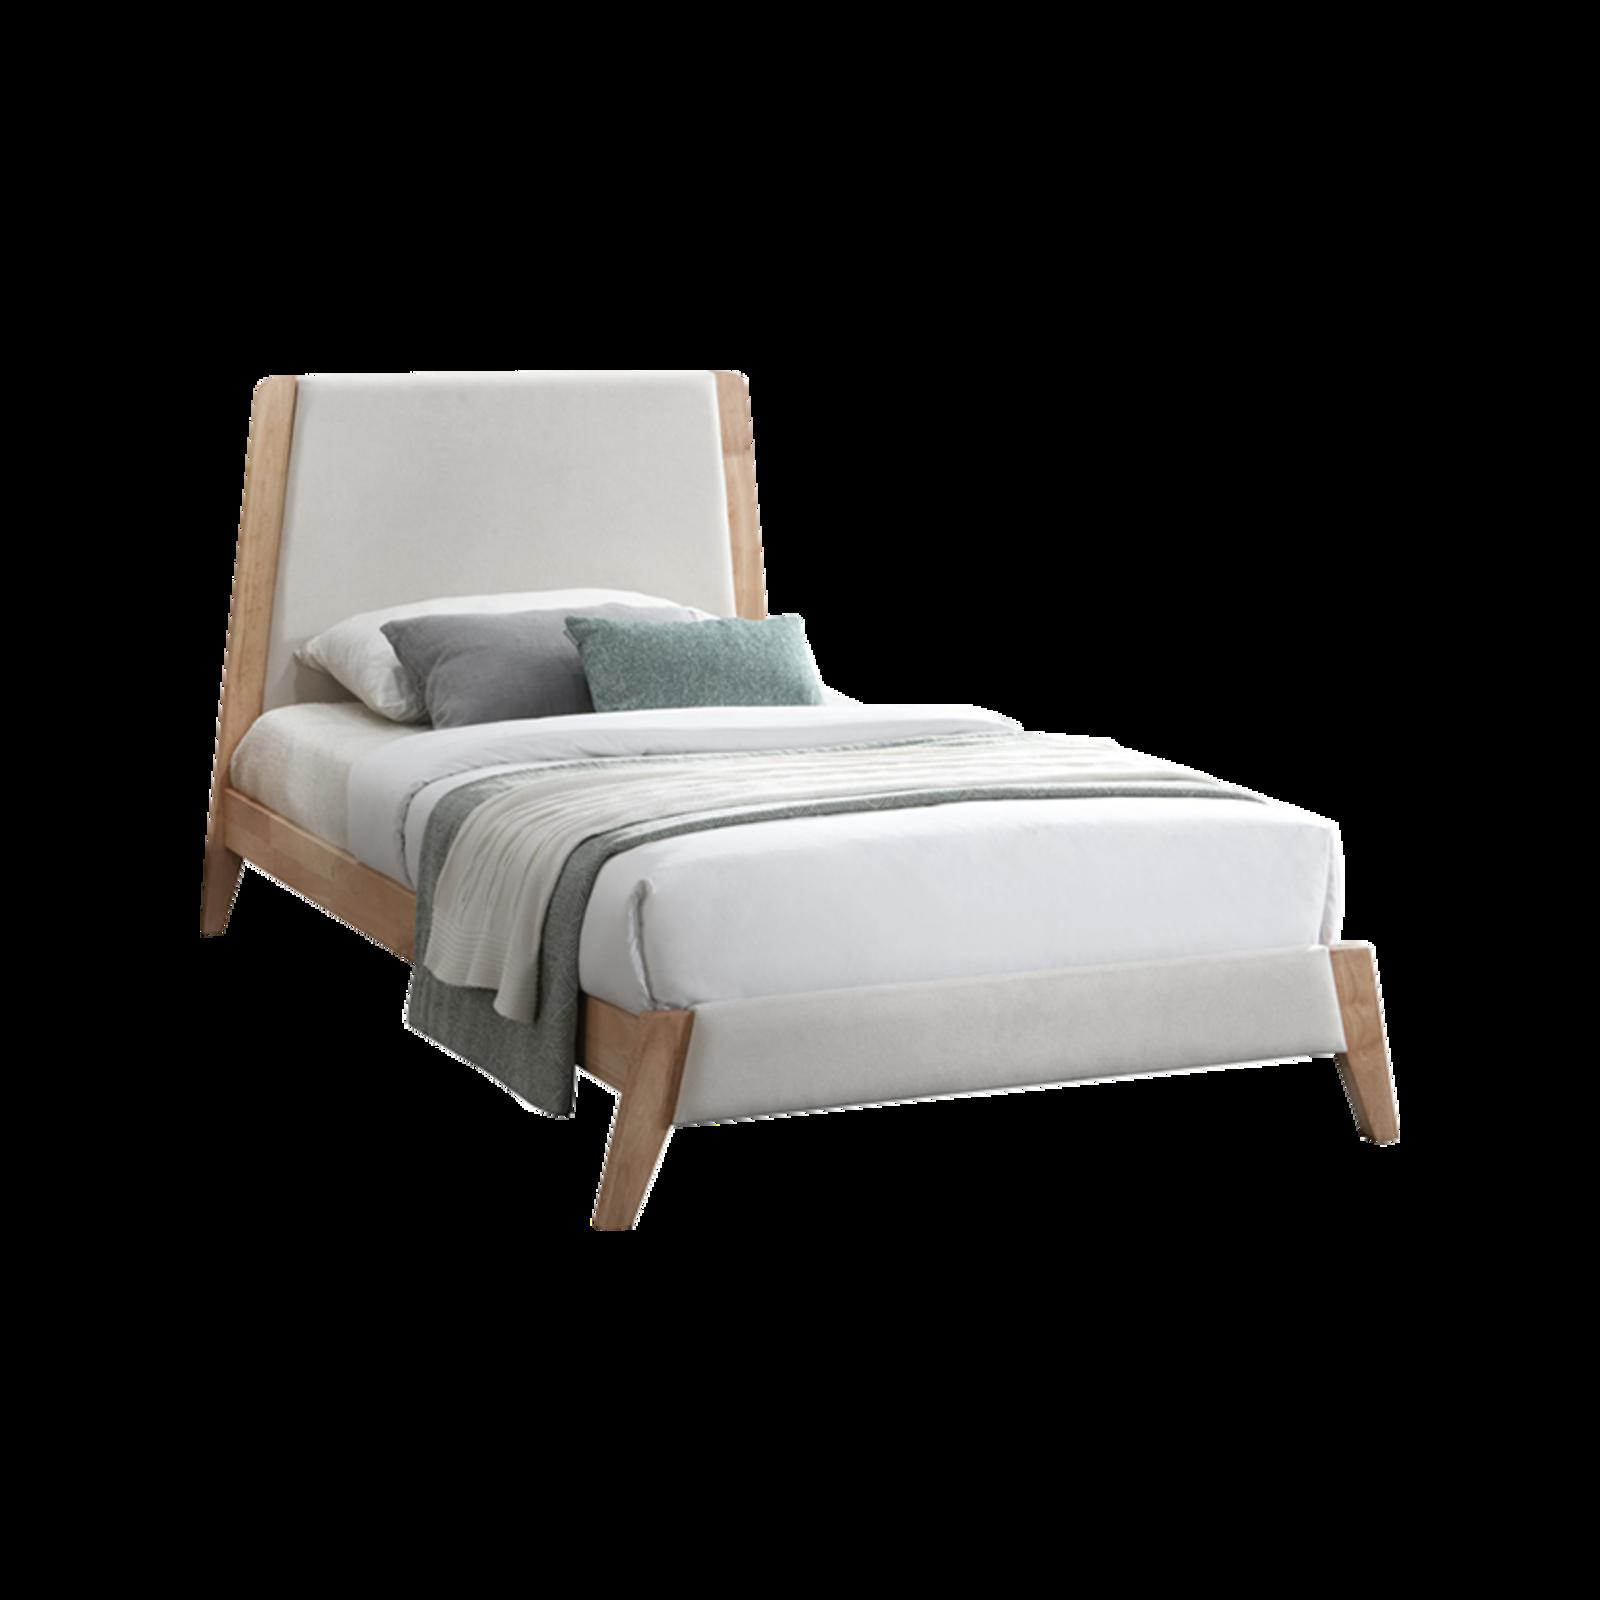 Finn King Single Hardwood  Bed and Mattress Set